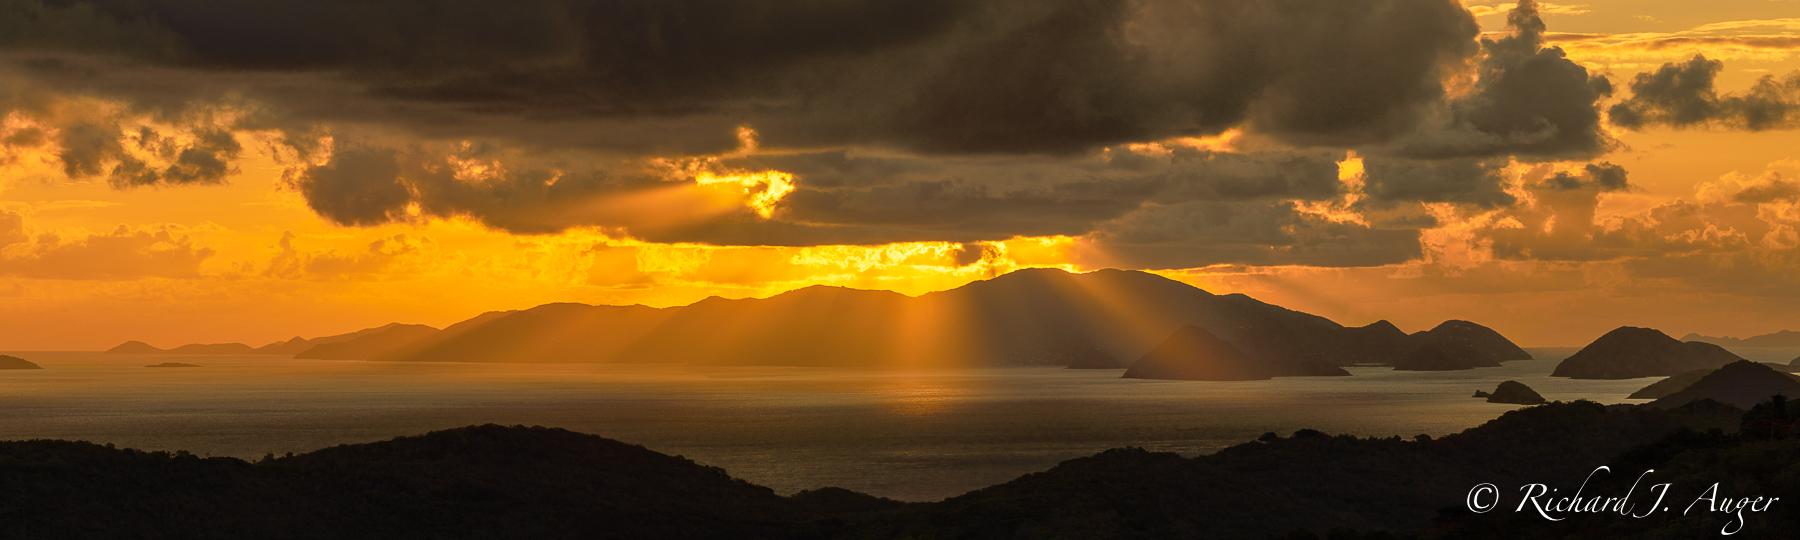 Magens Bay Overlook, St Thomas, US Virgin Islands, Dramatic, Sunrise, Orange, Mountains, Ocean